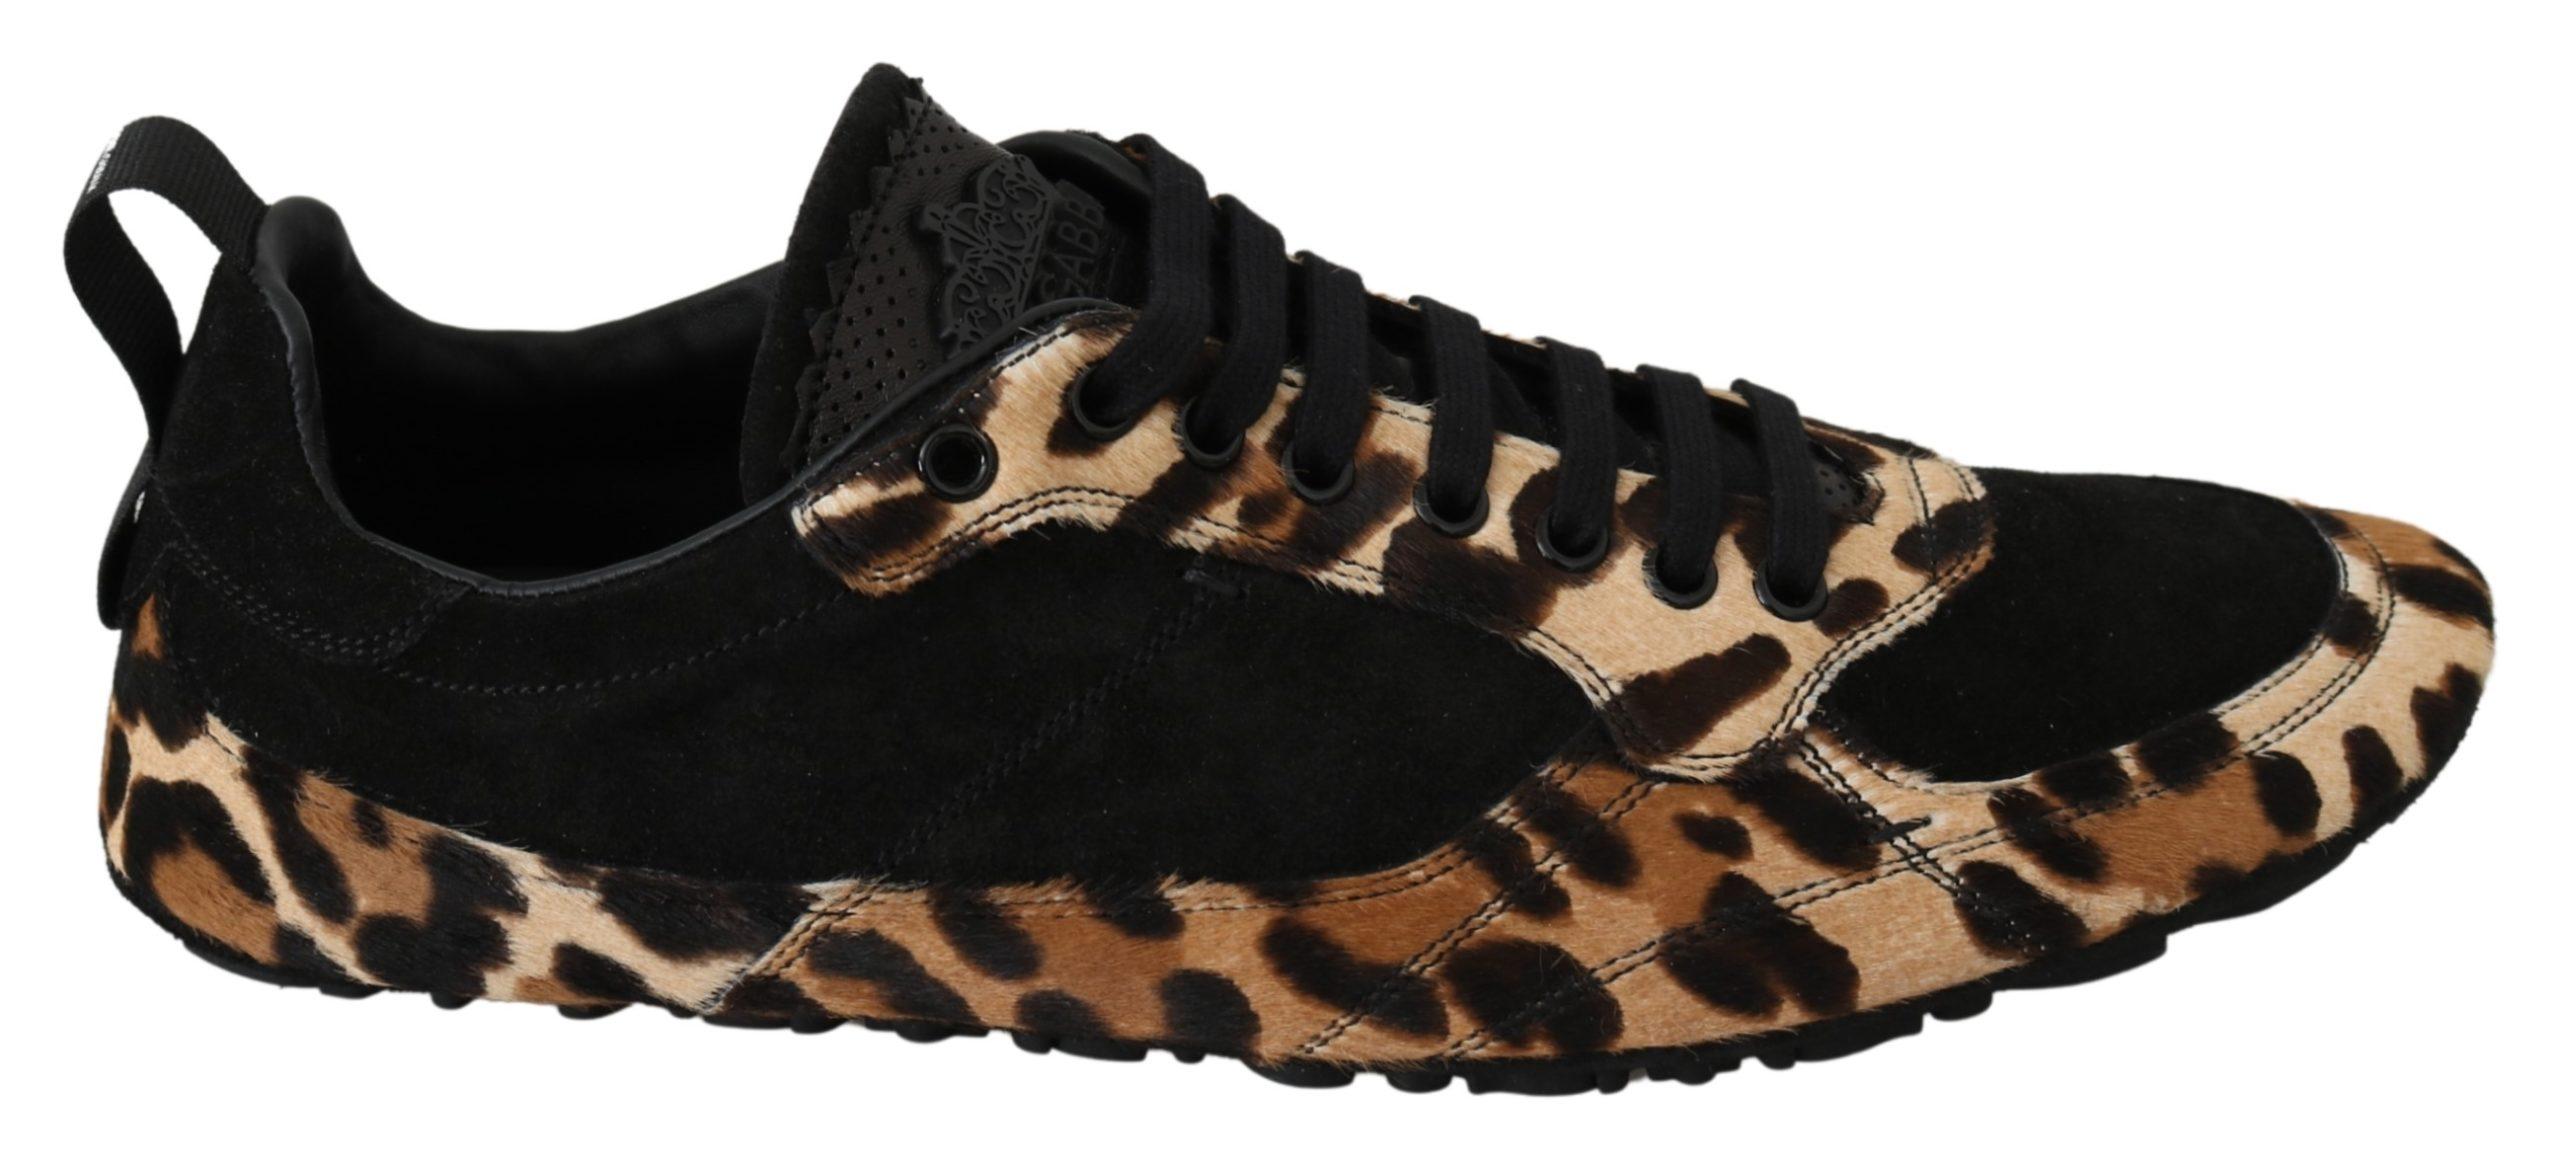 Dolce & Gabbana Men's Leather Leopard Trainer Black MV3042 - EU43/US10